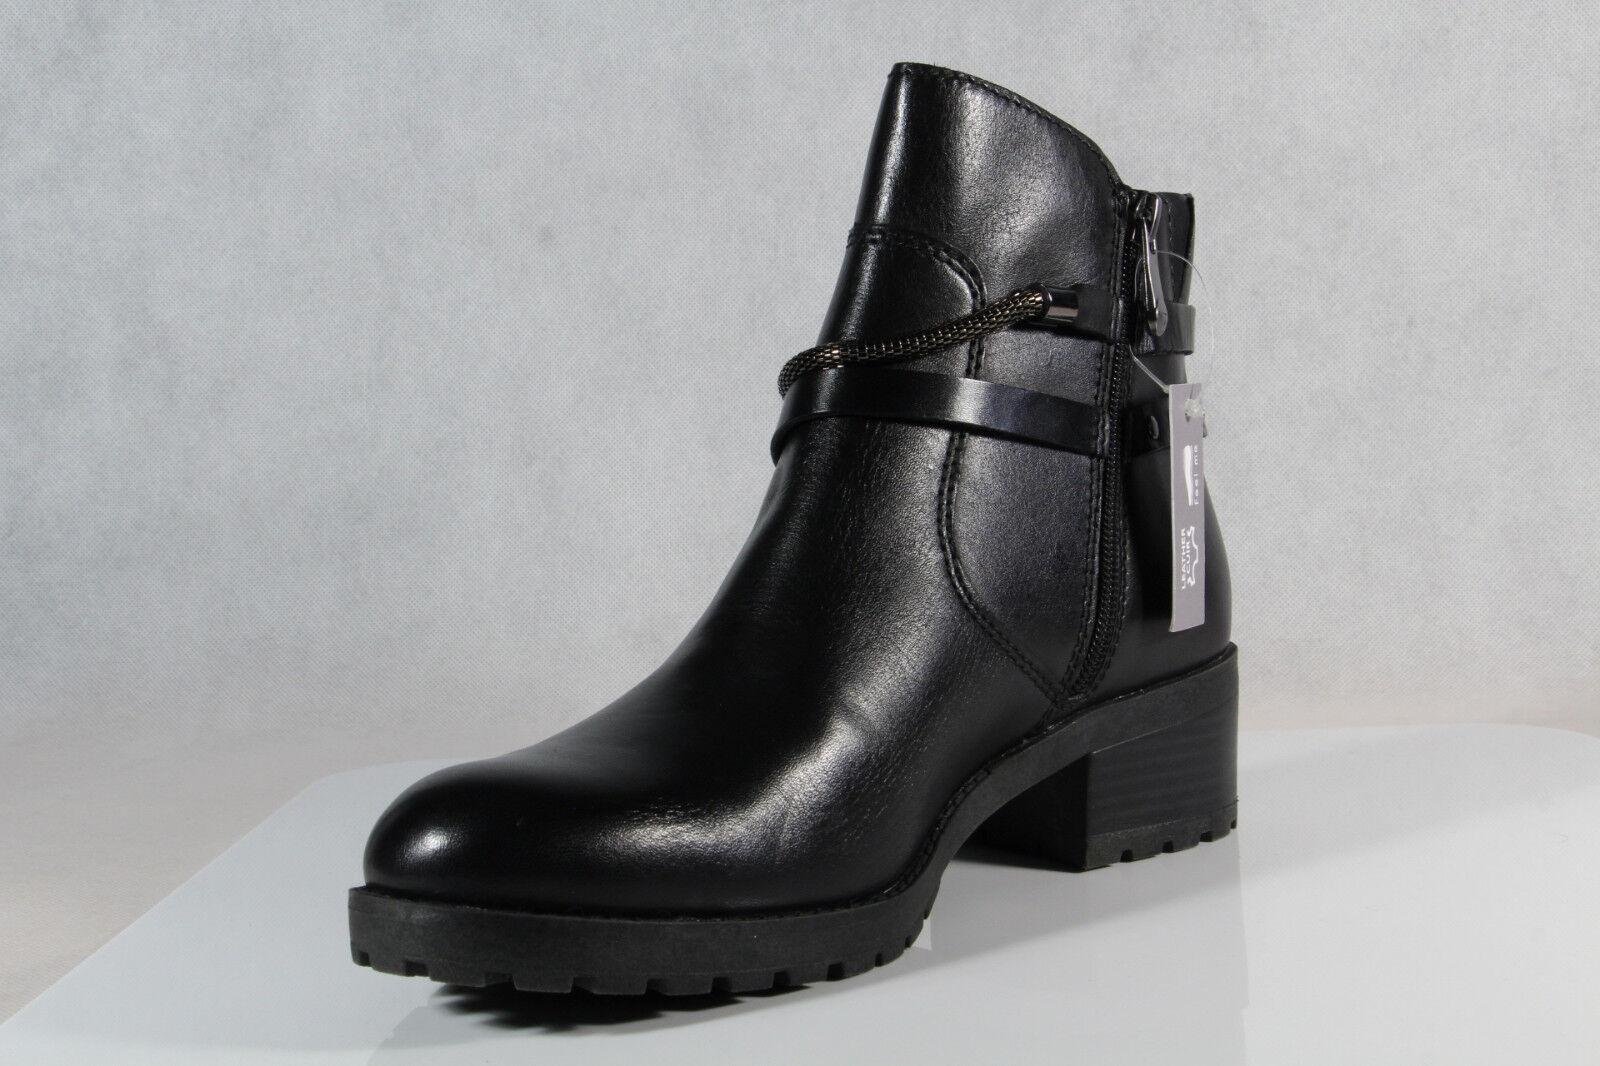 Marco Tozzi Botines Botines Botines Mujer botas de Invierno botas botas Negro 25475 Nuevo 415e5a